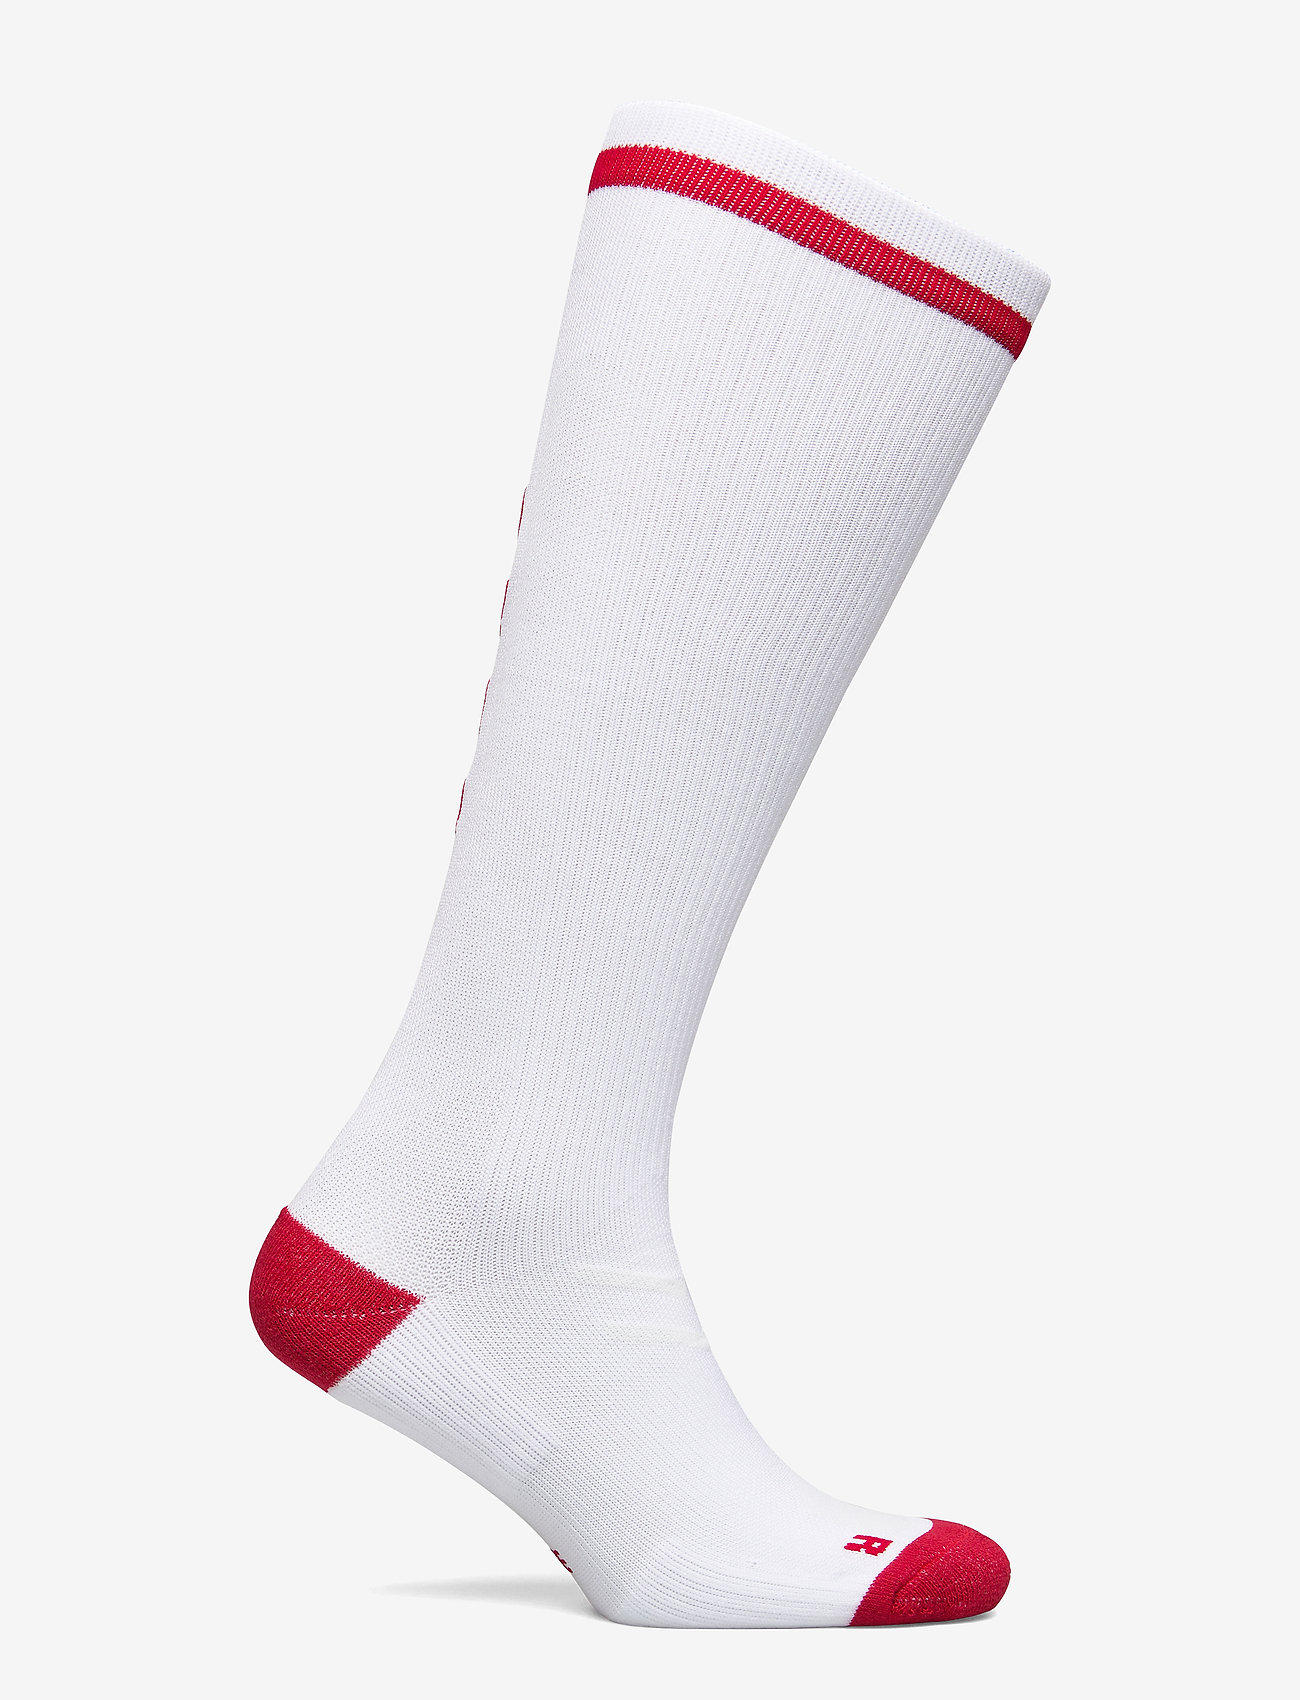 Hummel - ELITE INDOOR SOCK HIGH - jalkapallosukat - white/true red - 1